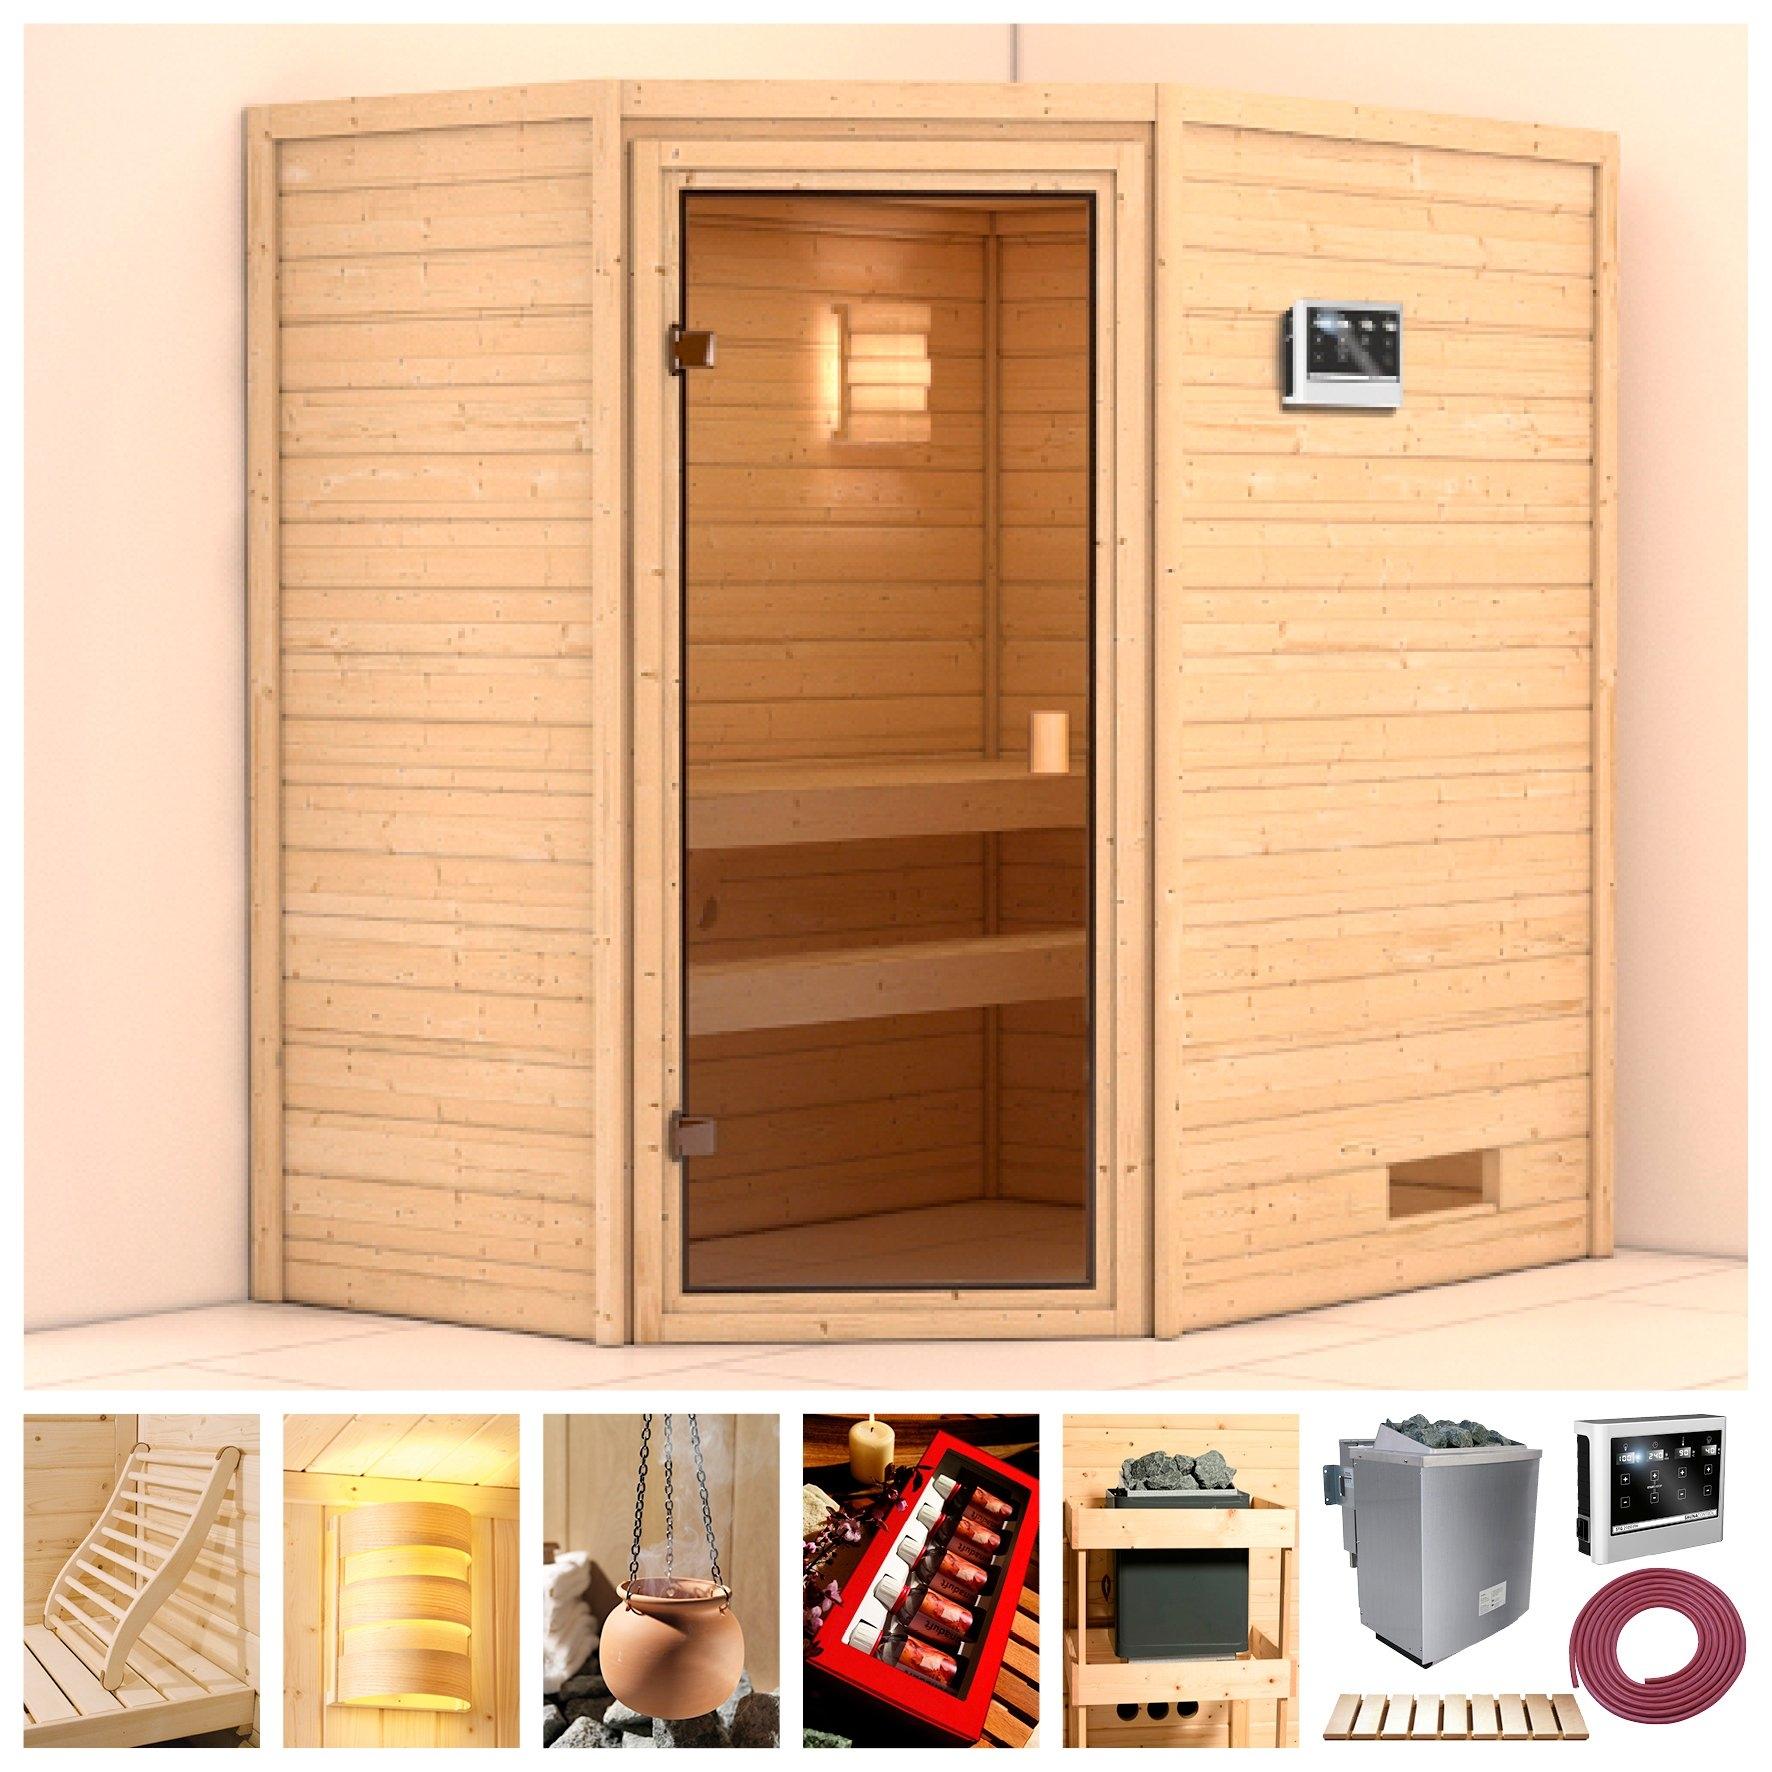 Karibu sauna »Langeoog«, 196x146x198 cm, 9 kW Bio-Kombiofen mit ext. Steuerung - gratis ruilen op otto.nl